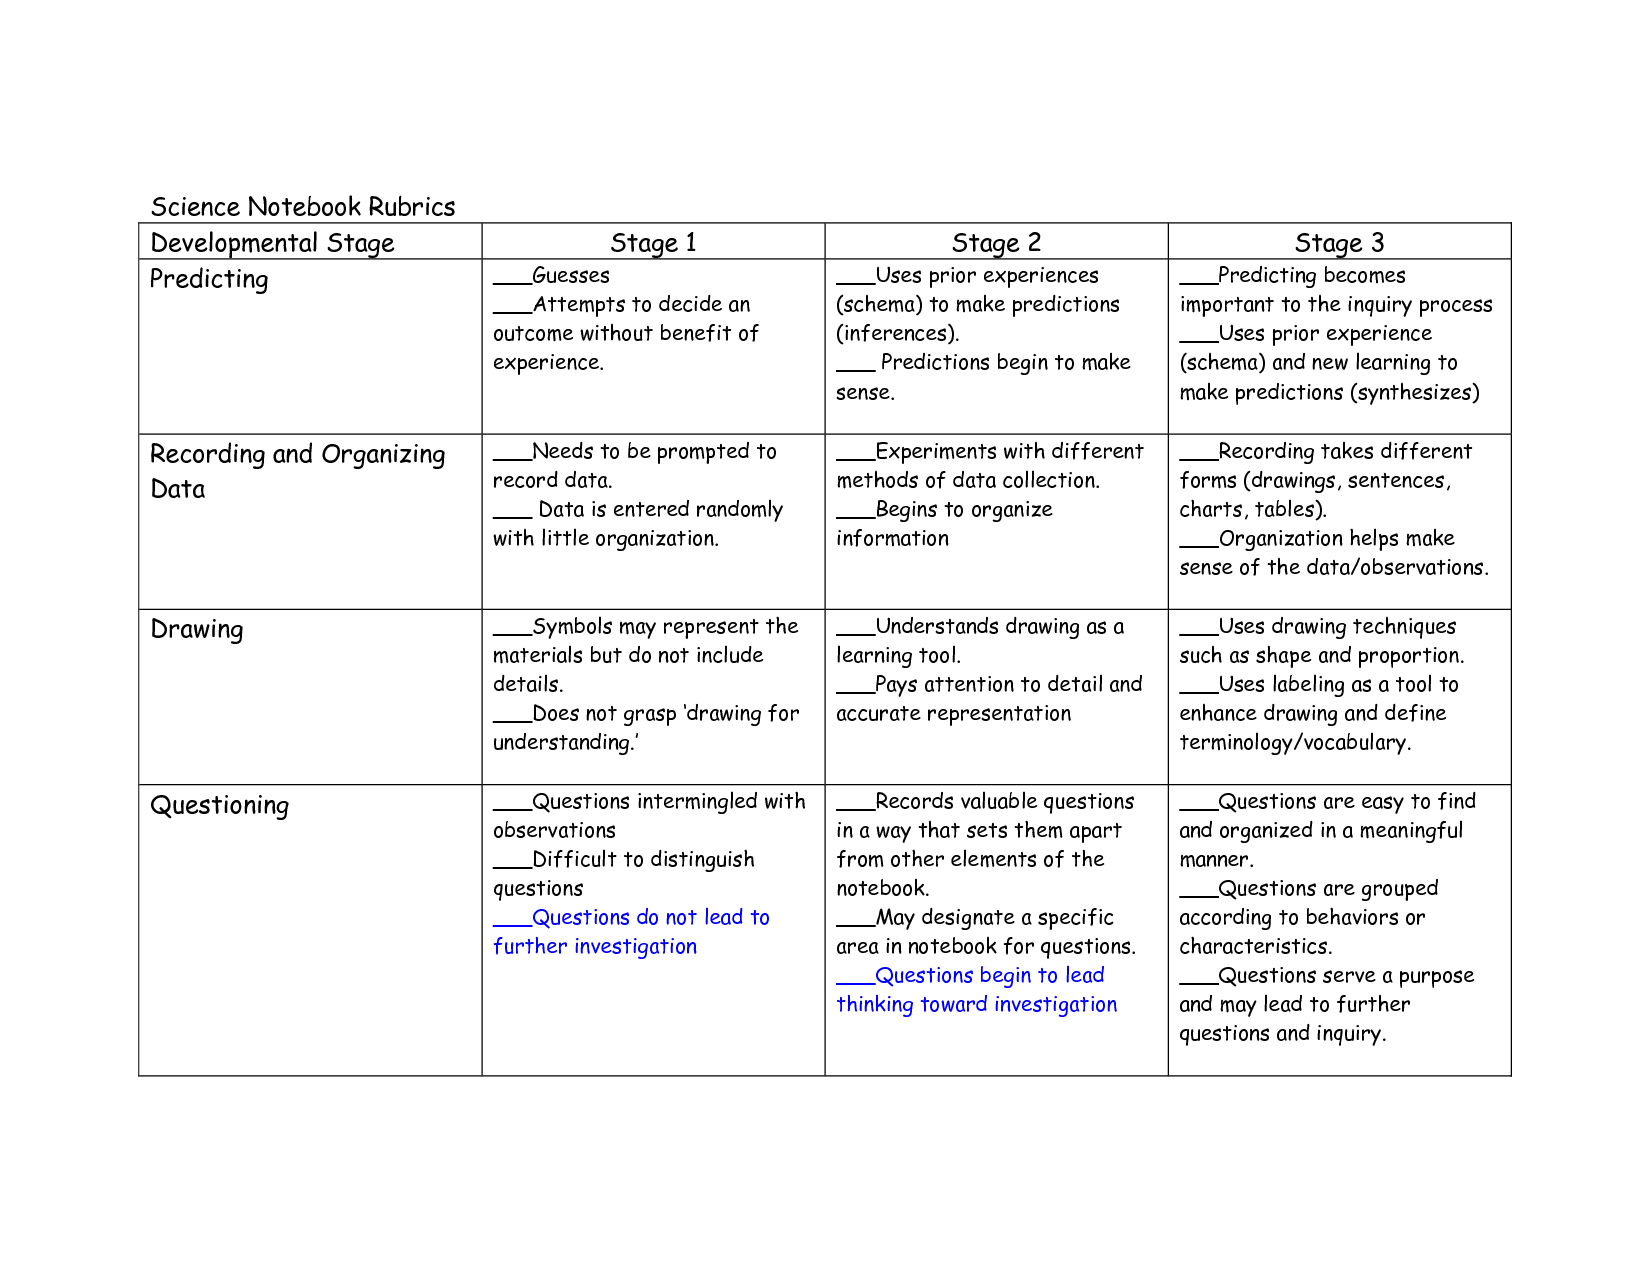 plans in the future essay zone